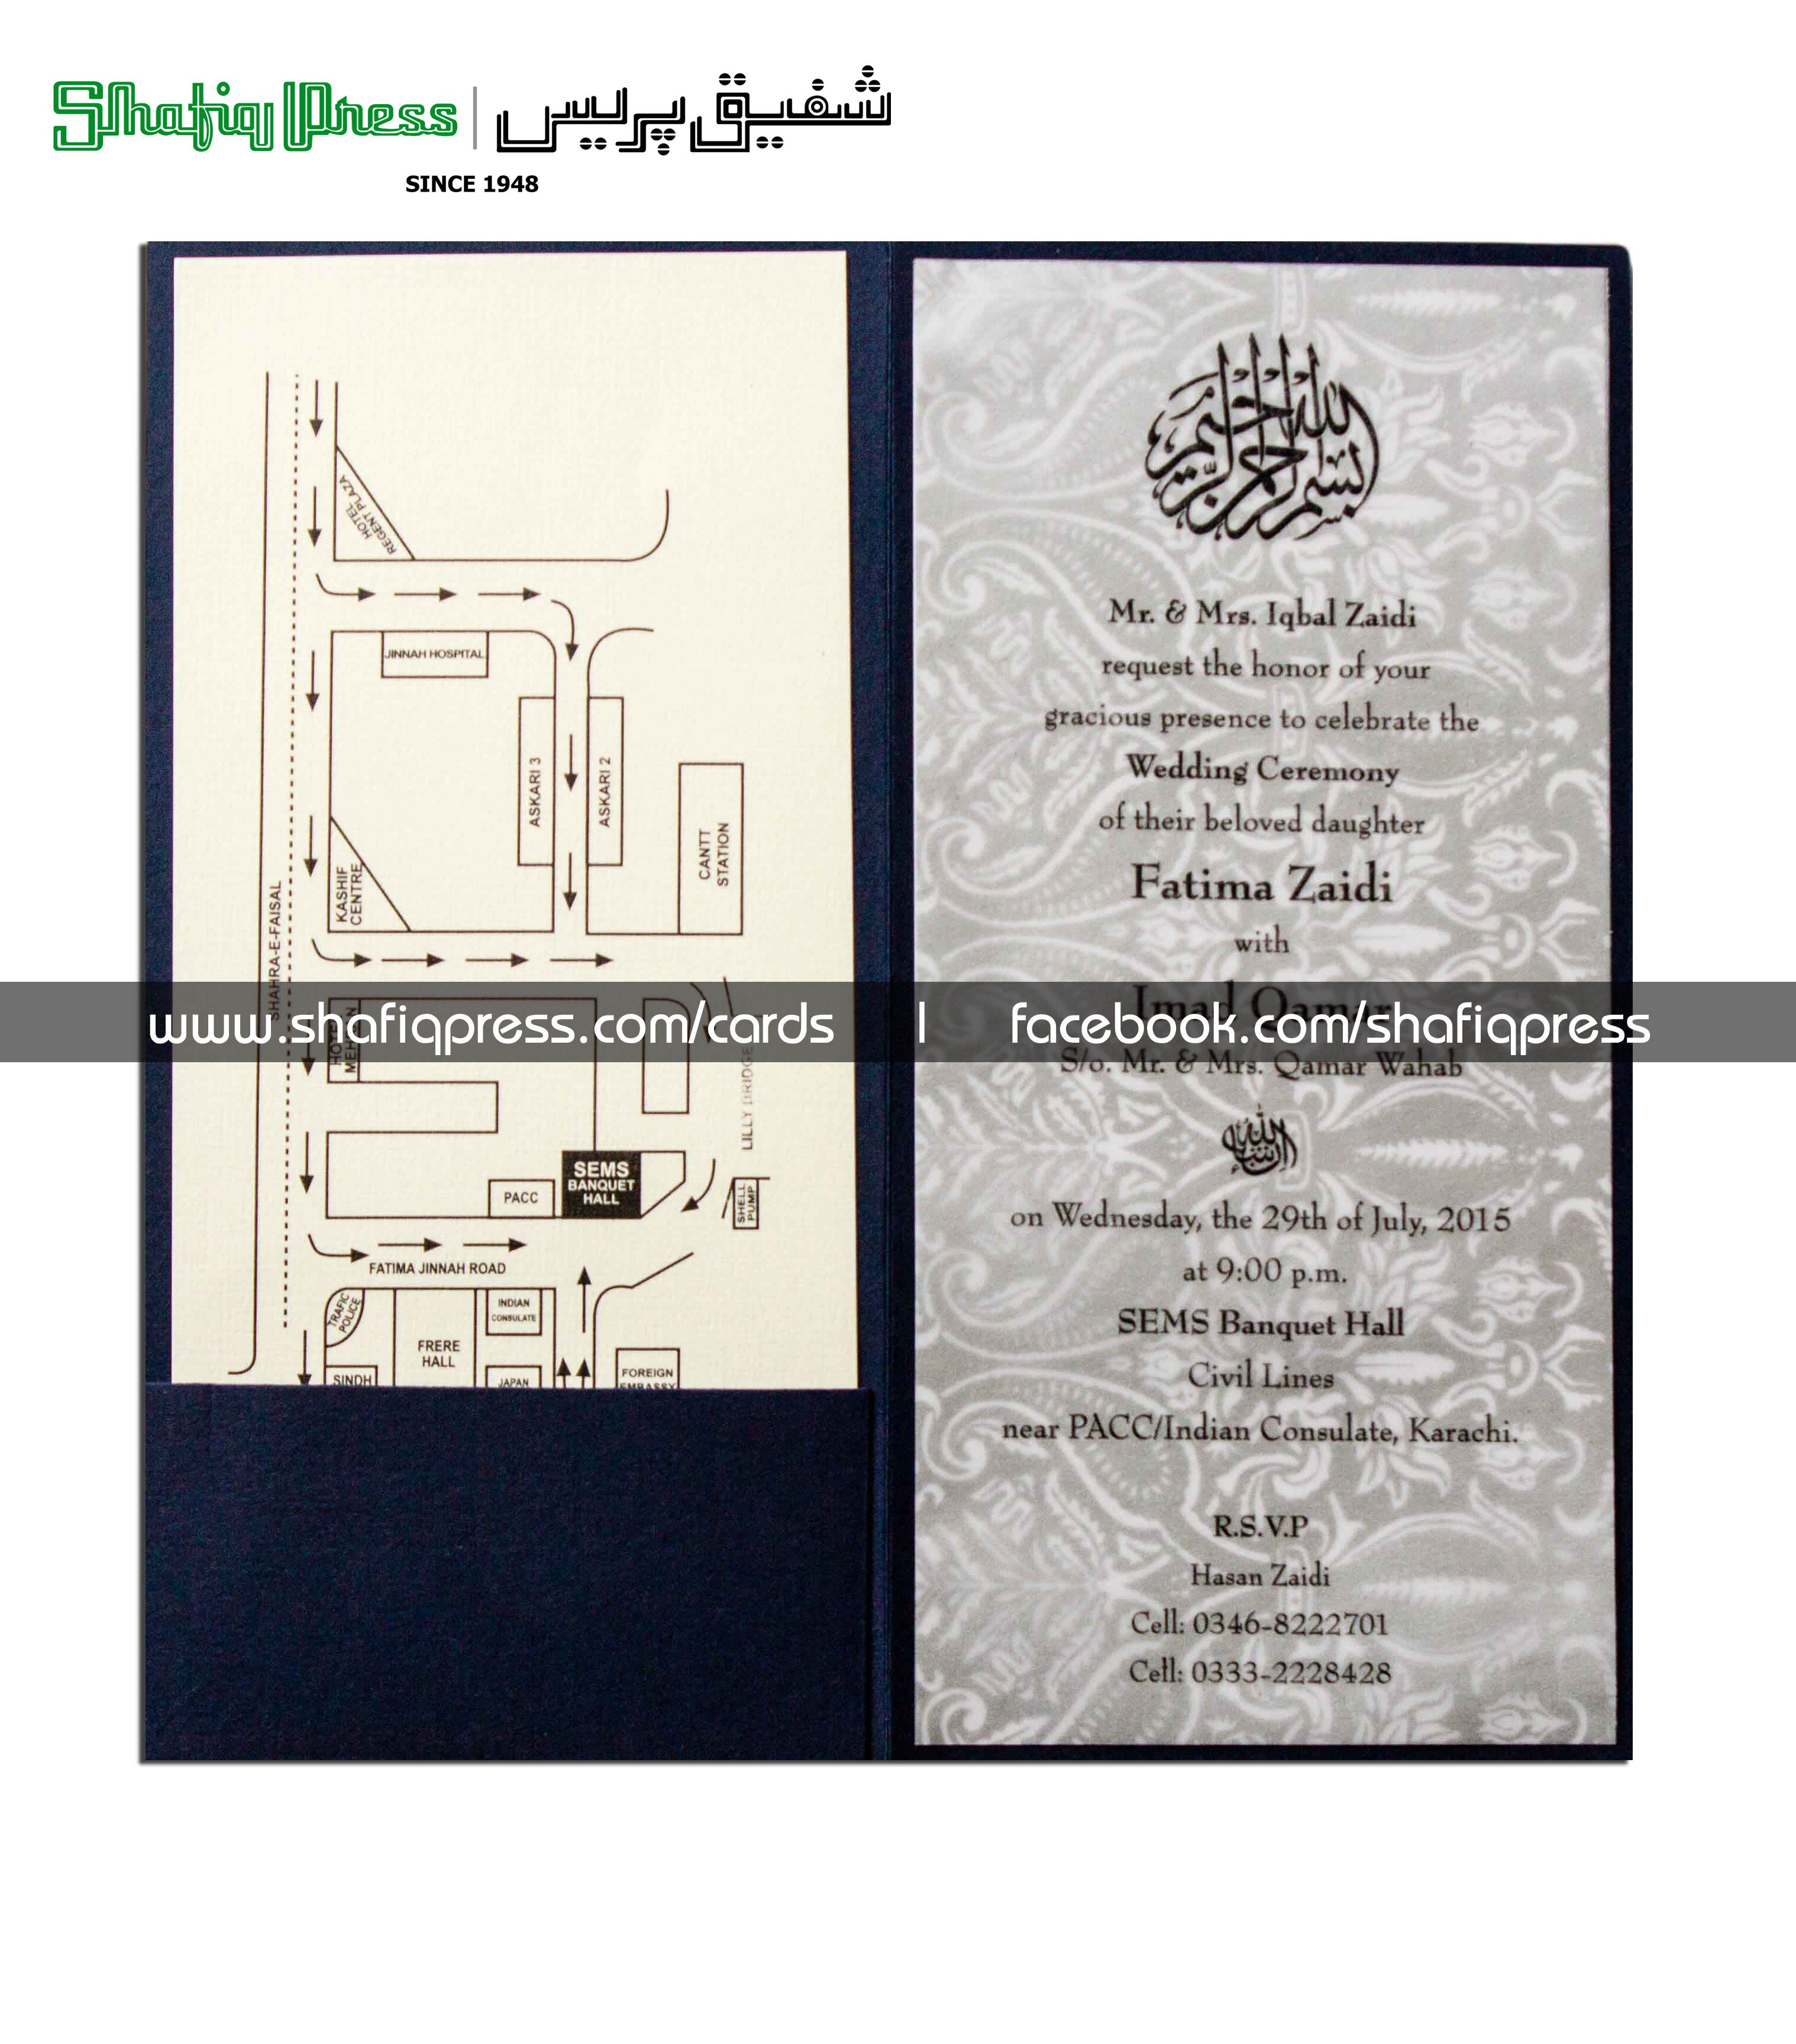 Whatsapp text jokes sms hindi indian creative and unique shafiqpress shadi cards wedding card printing wedding invitation cards shadi card design stopboris Image collections